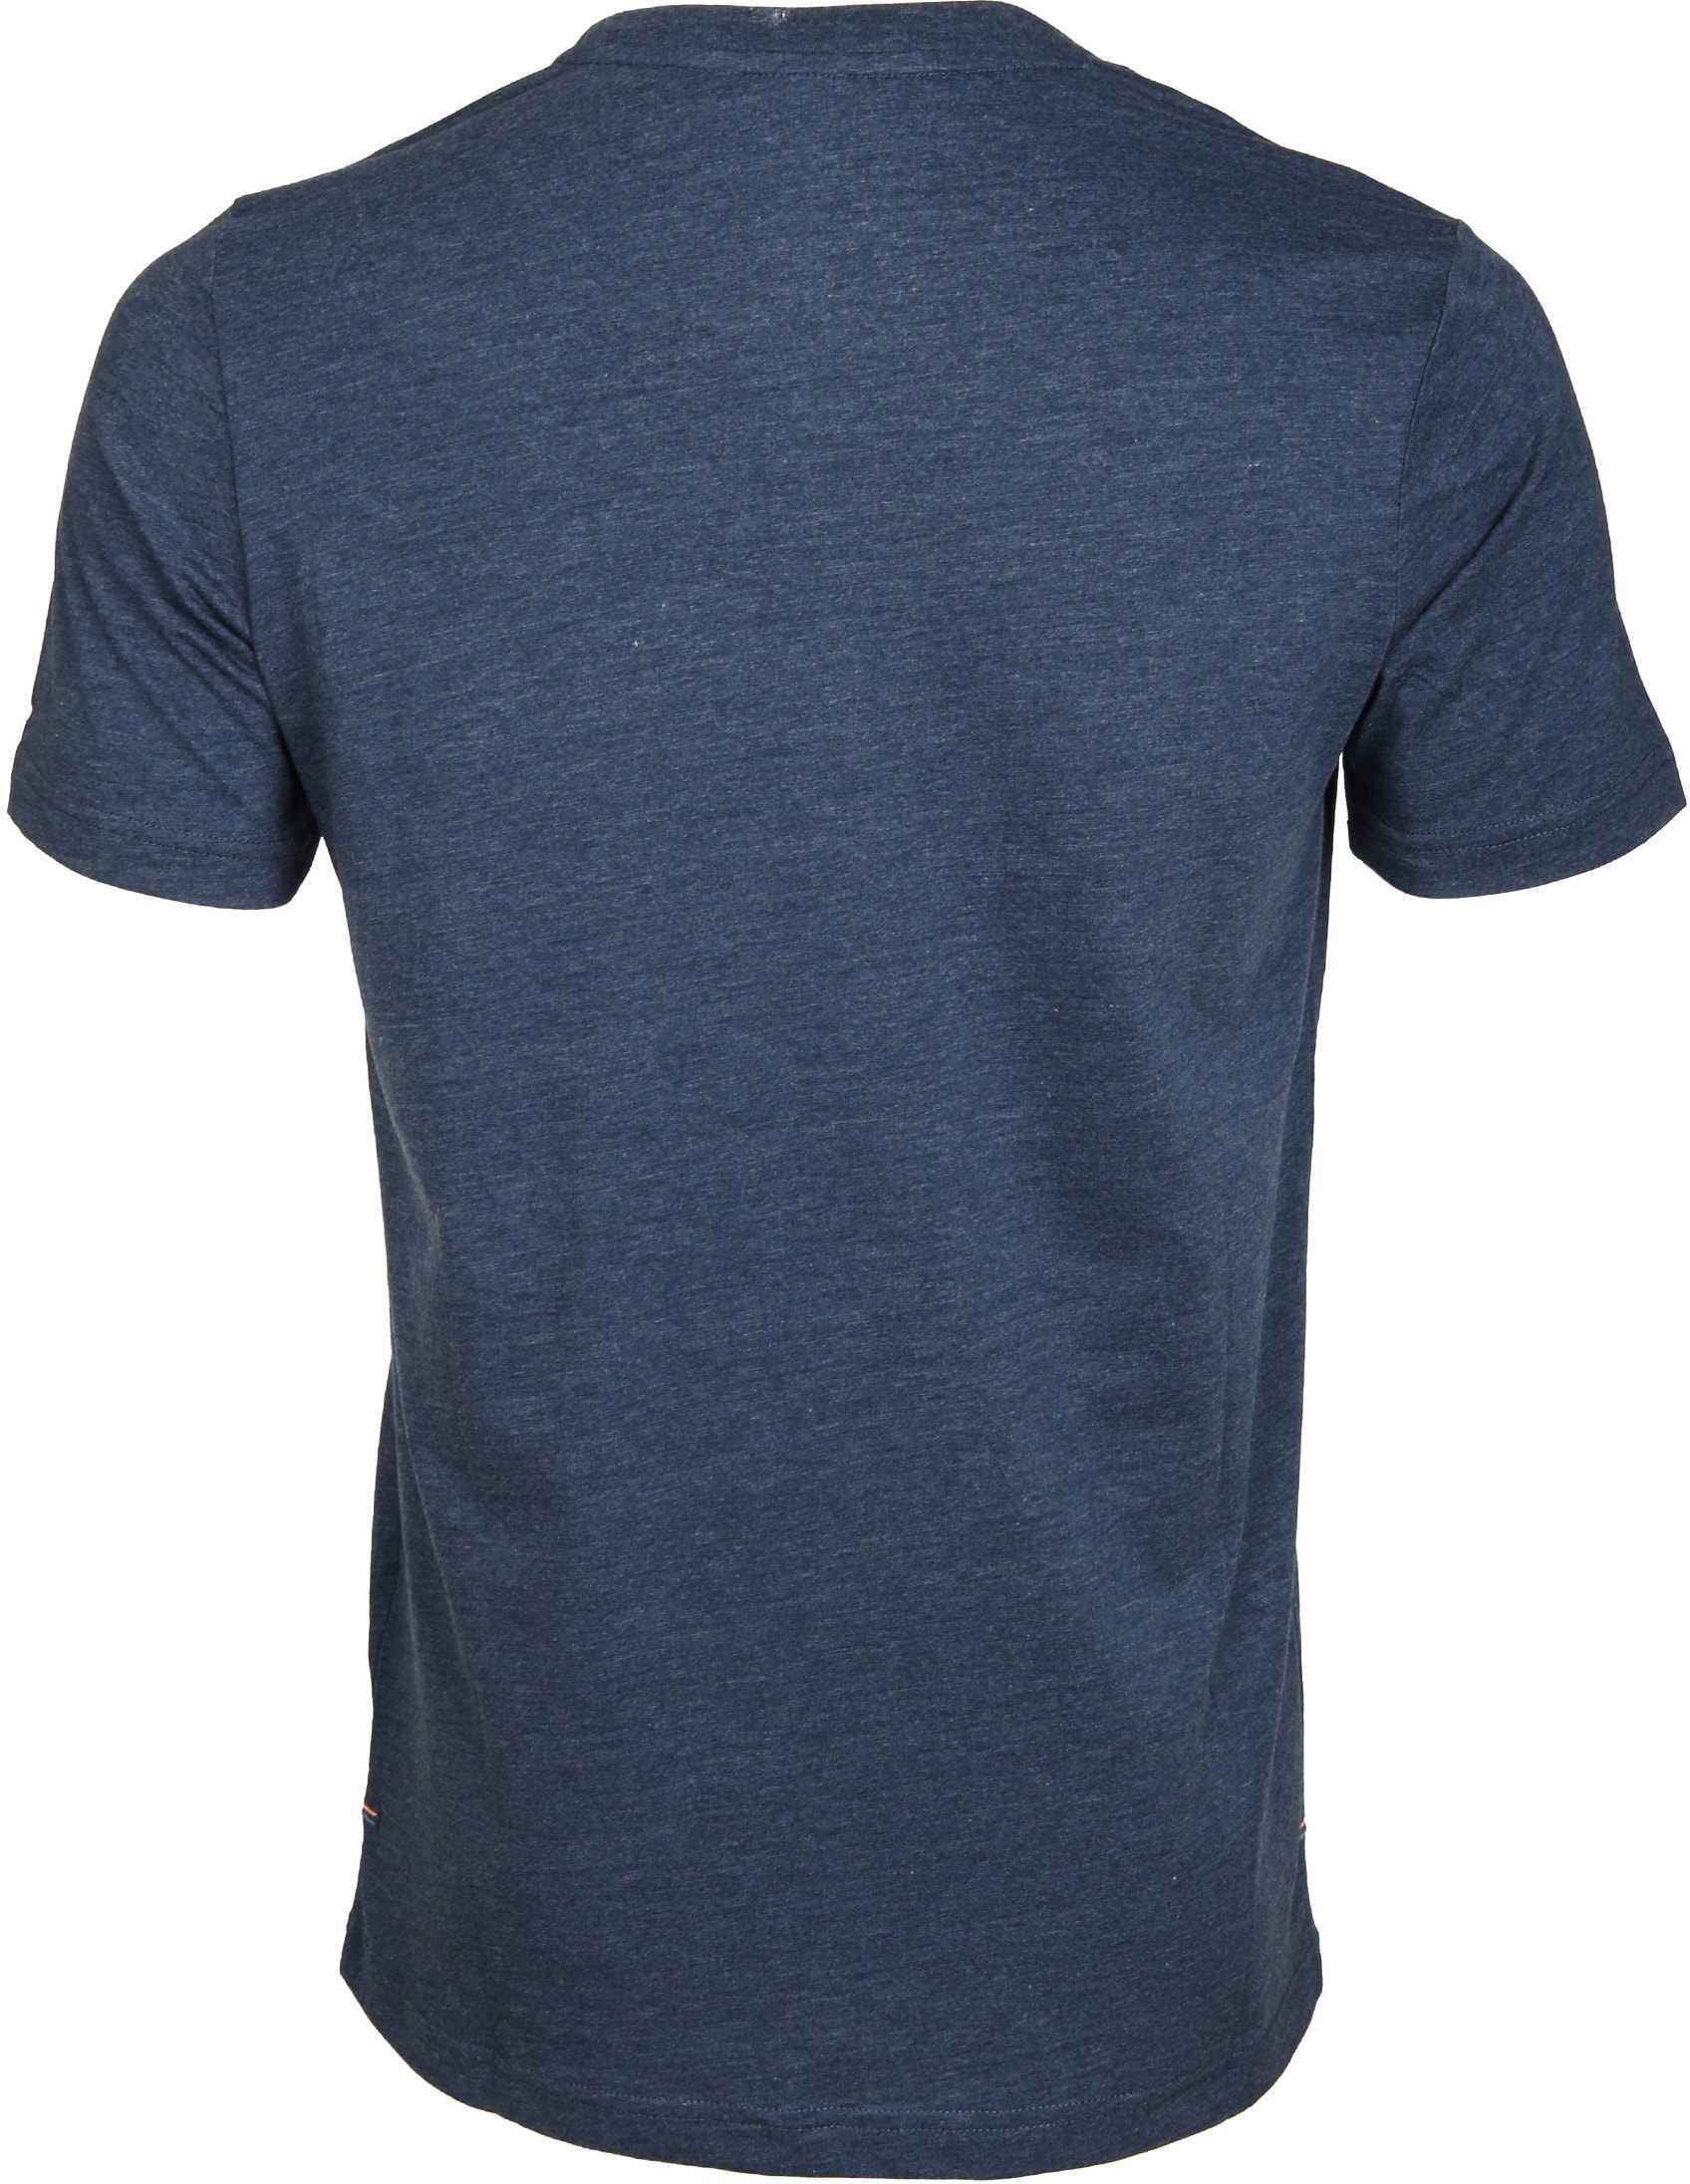 NZA Hapuka T-shirt Dunkelblau foto 2